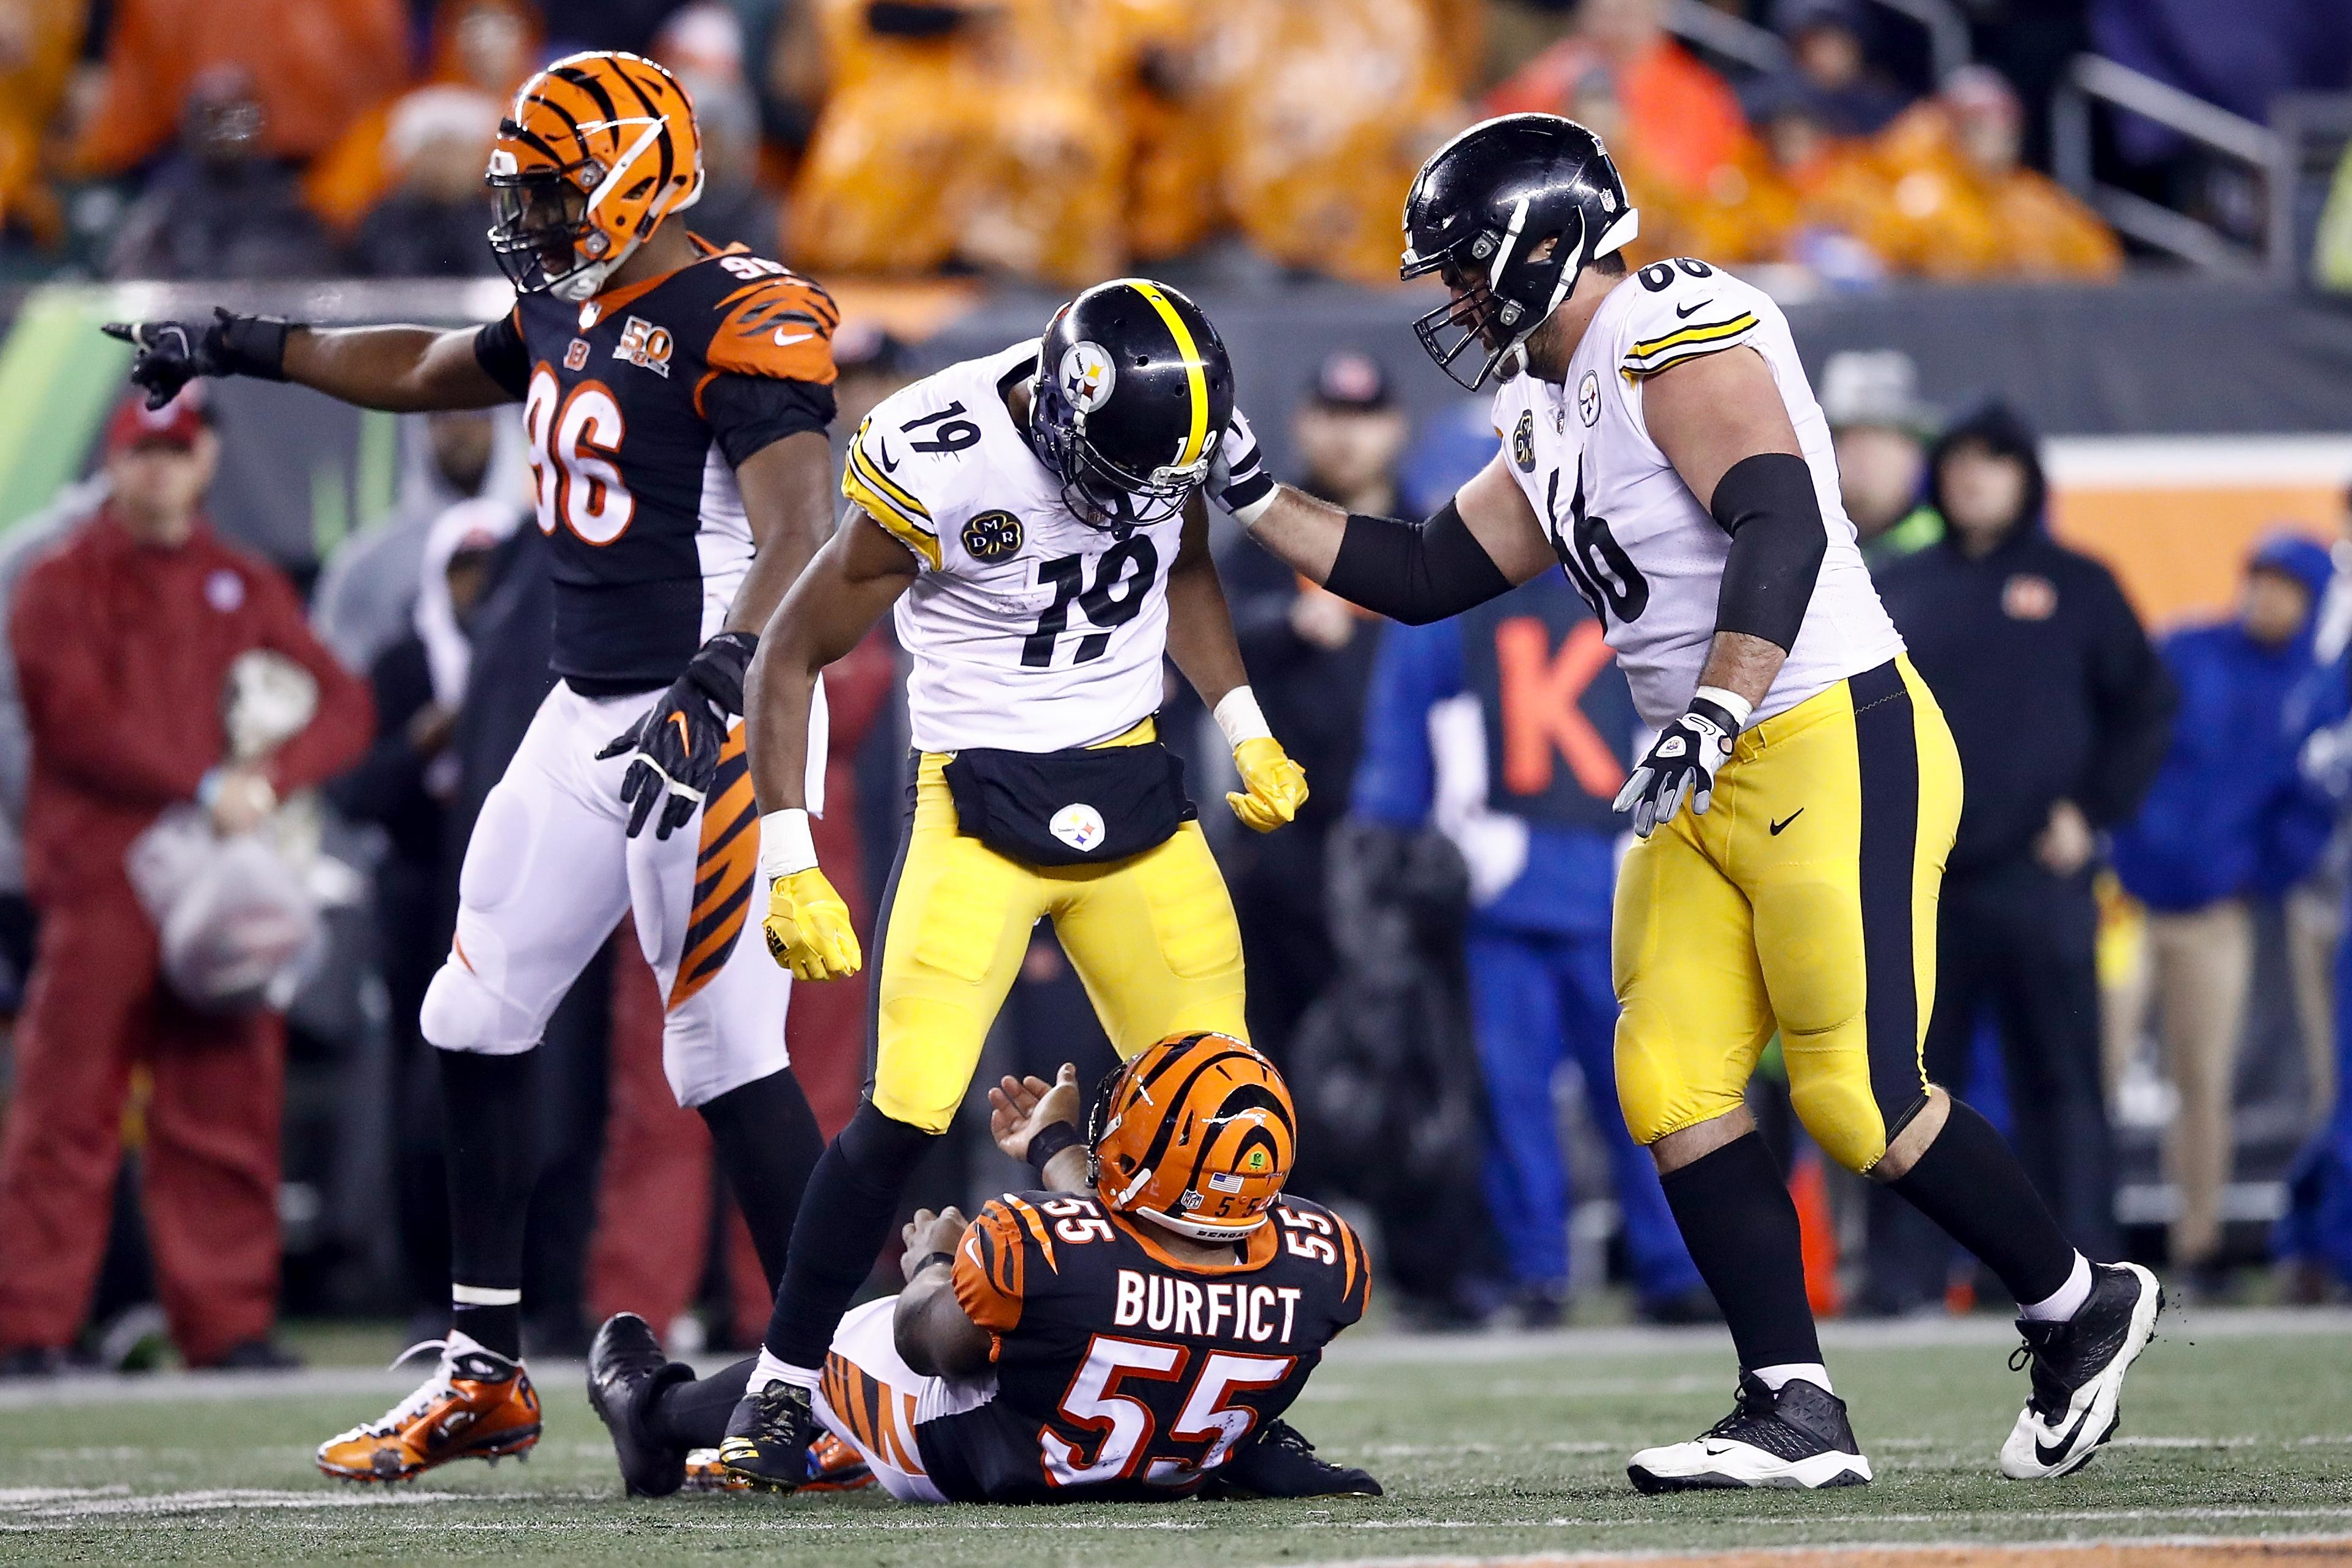 Steelers WR JuJu Smith-Schuster facing suspension